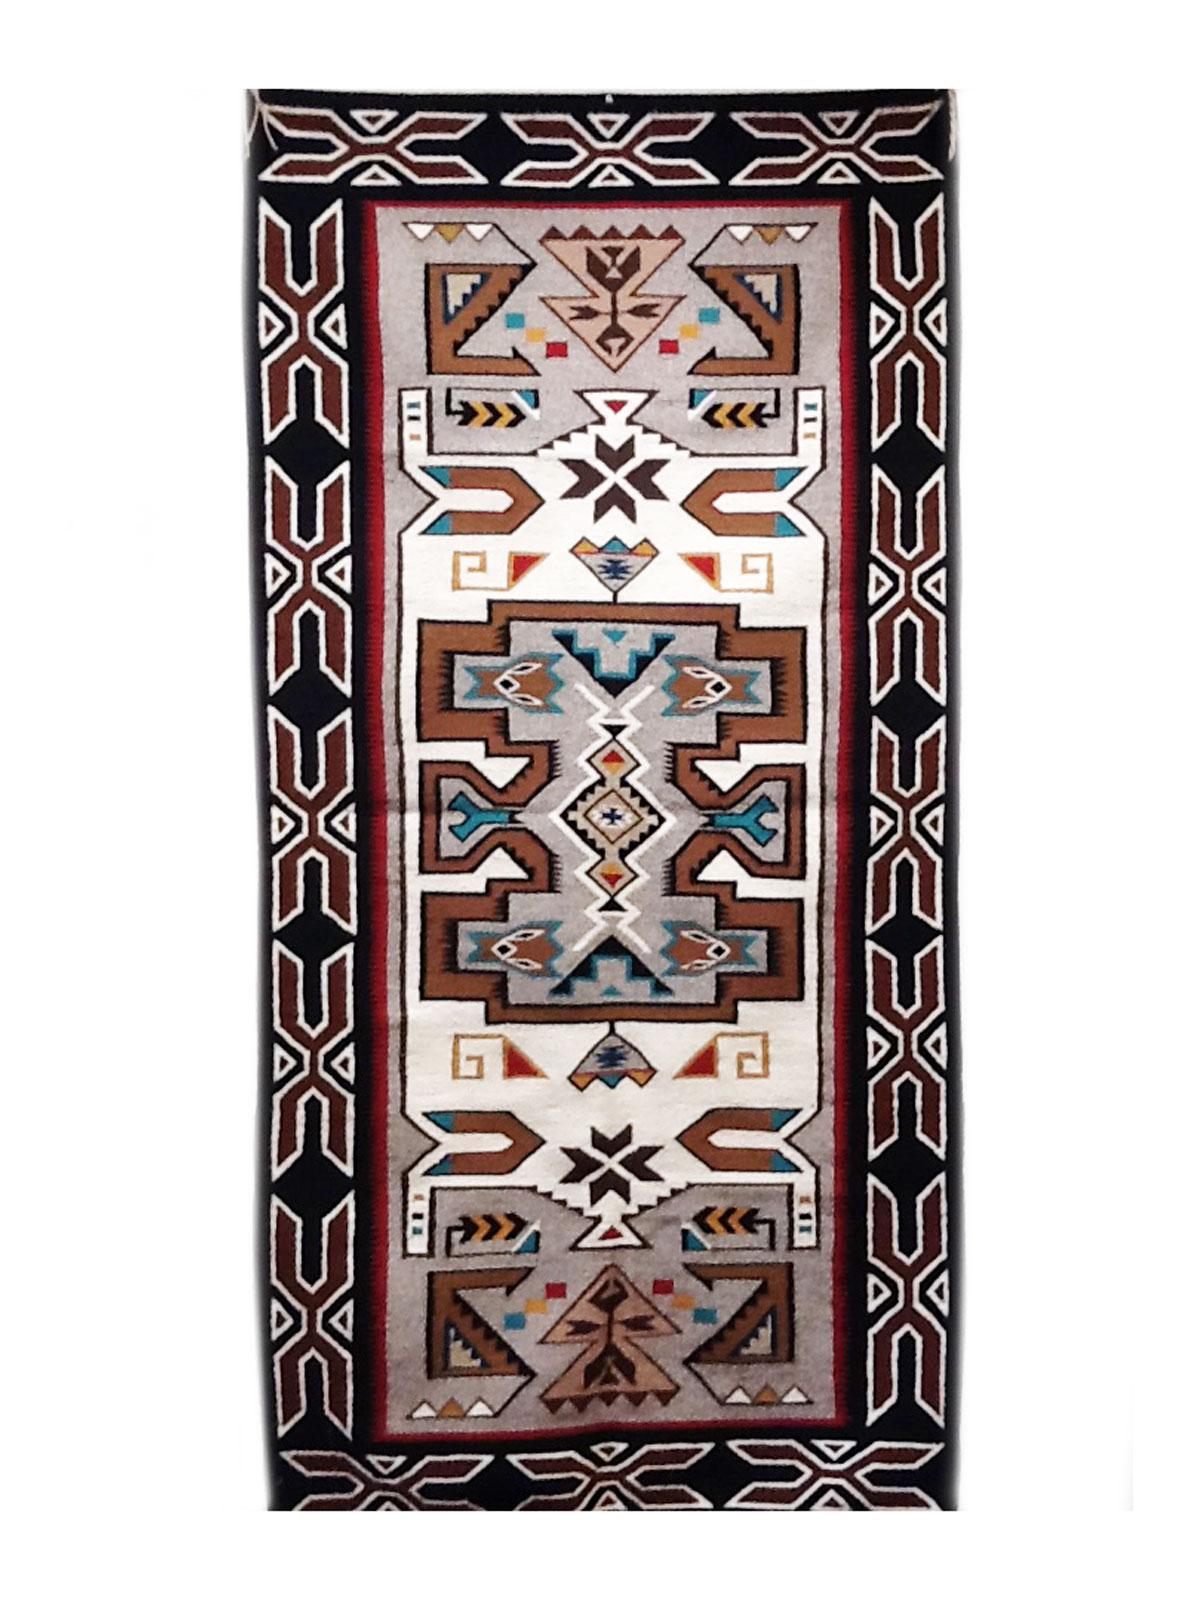 Teec Nos Pos Navajo Weaving